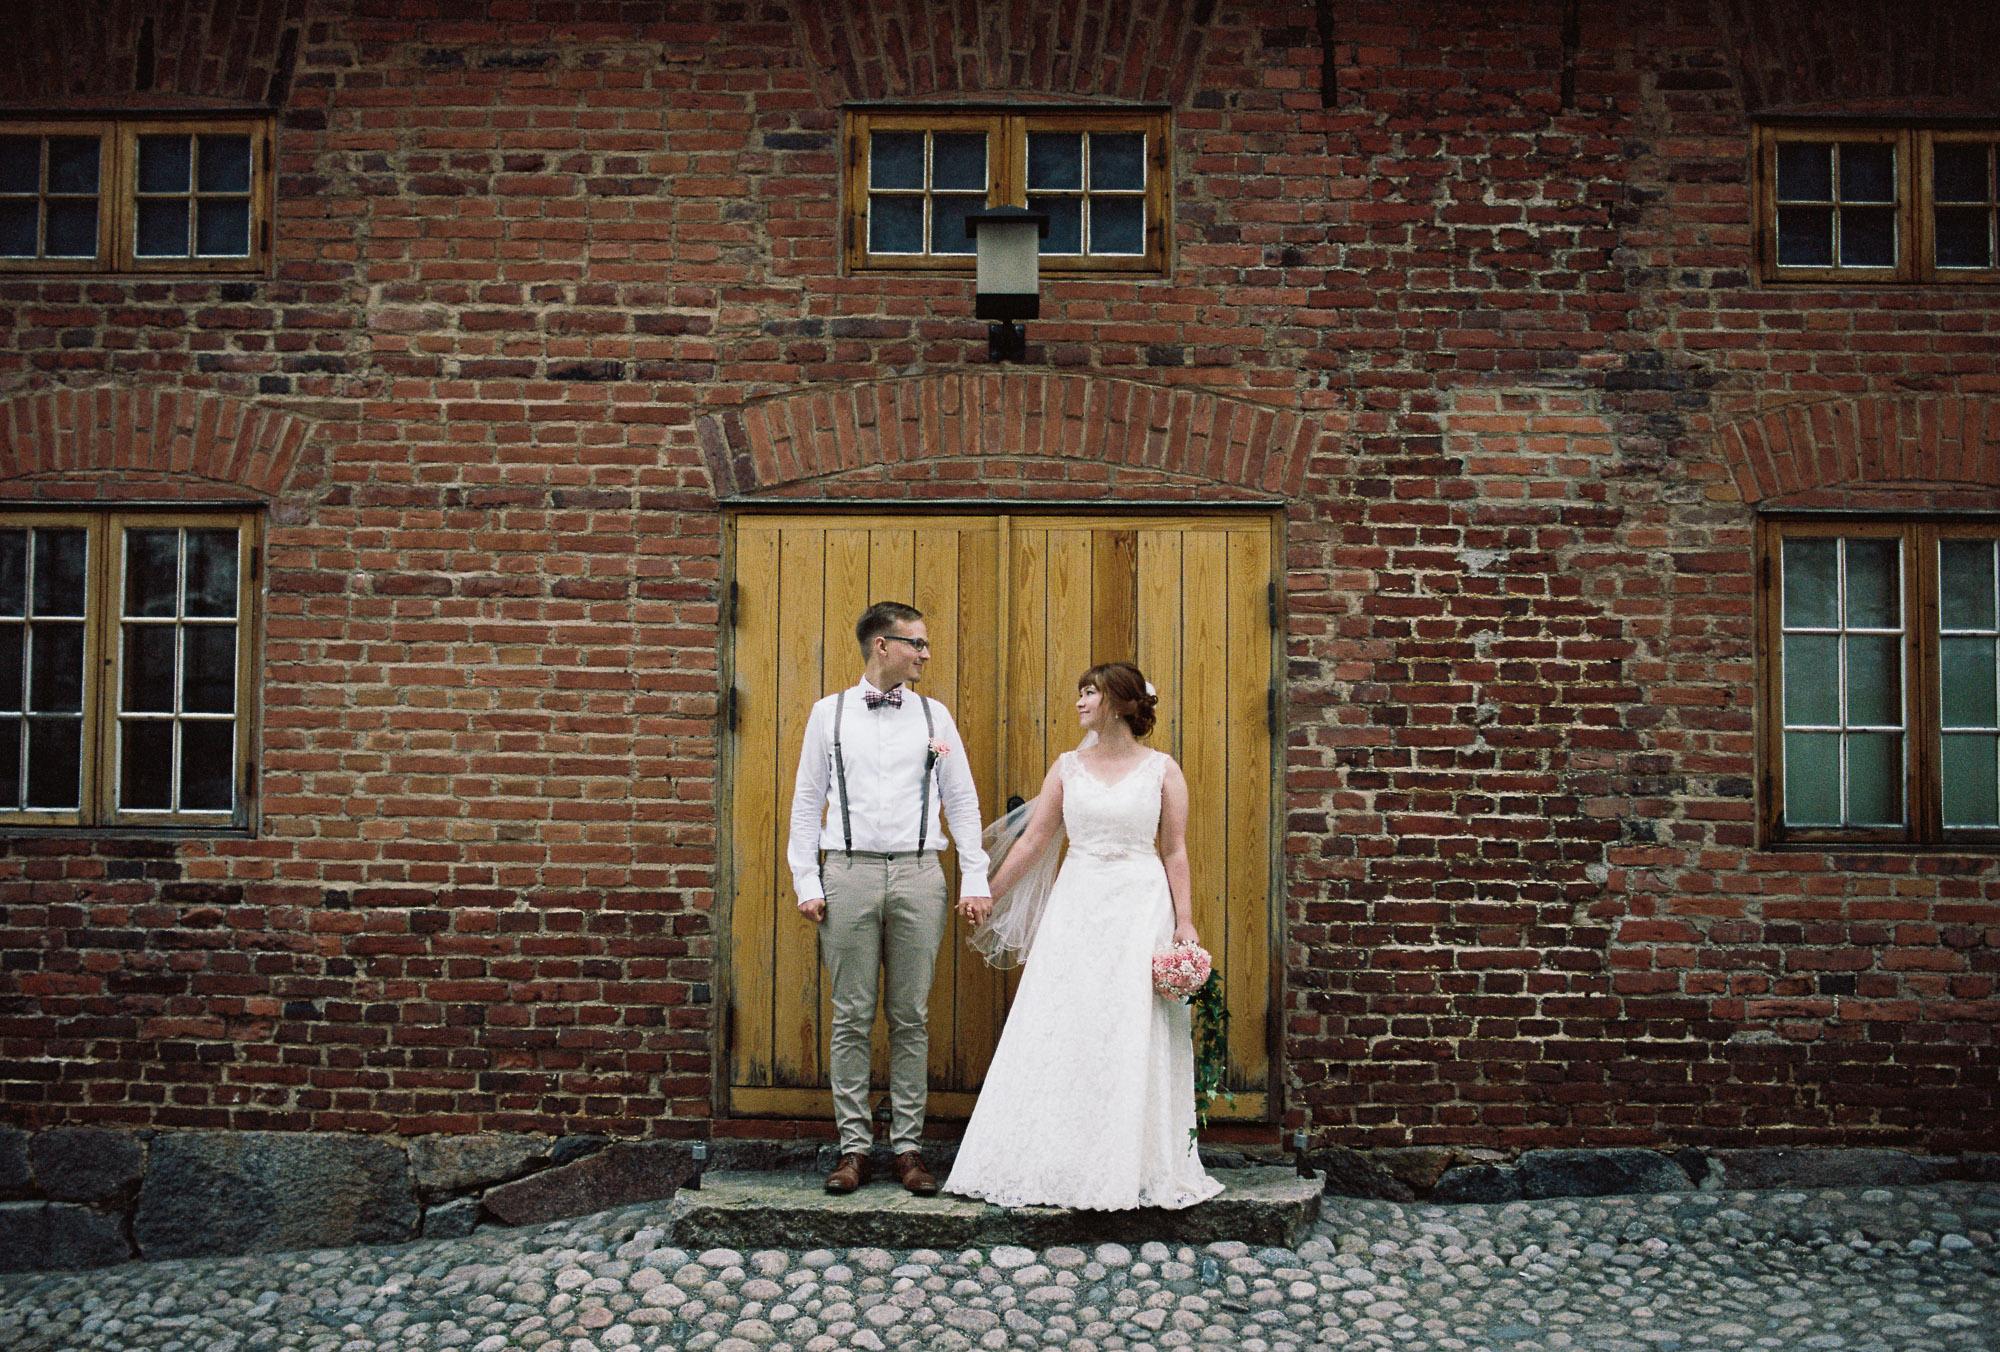 jere-satamo-analog-film-wedding-photographer-finland-178.jpg